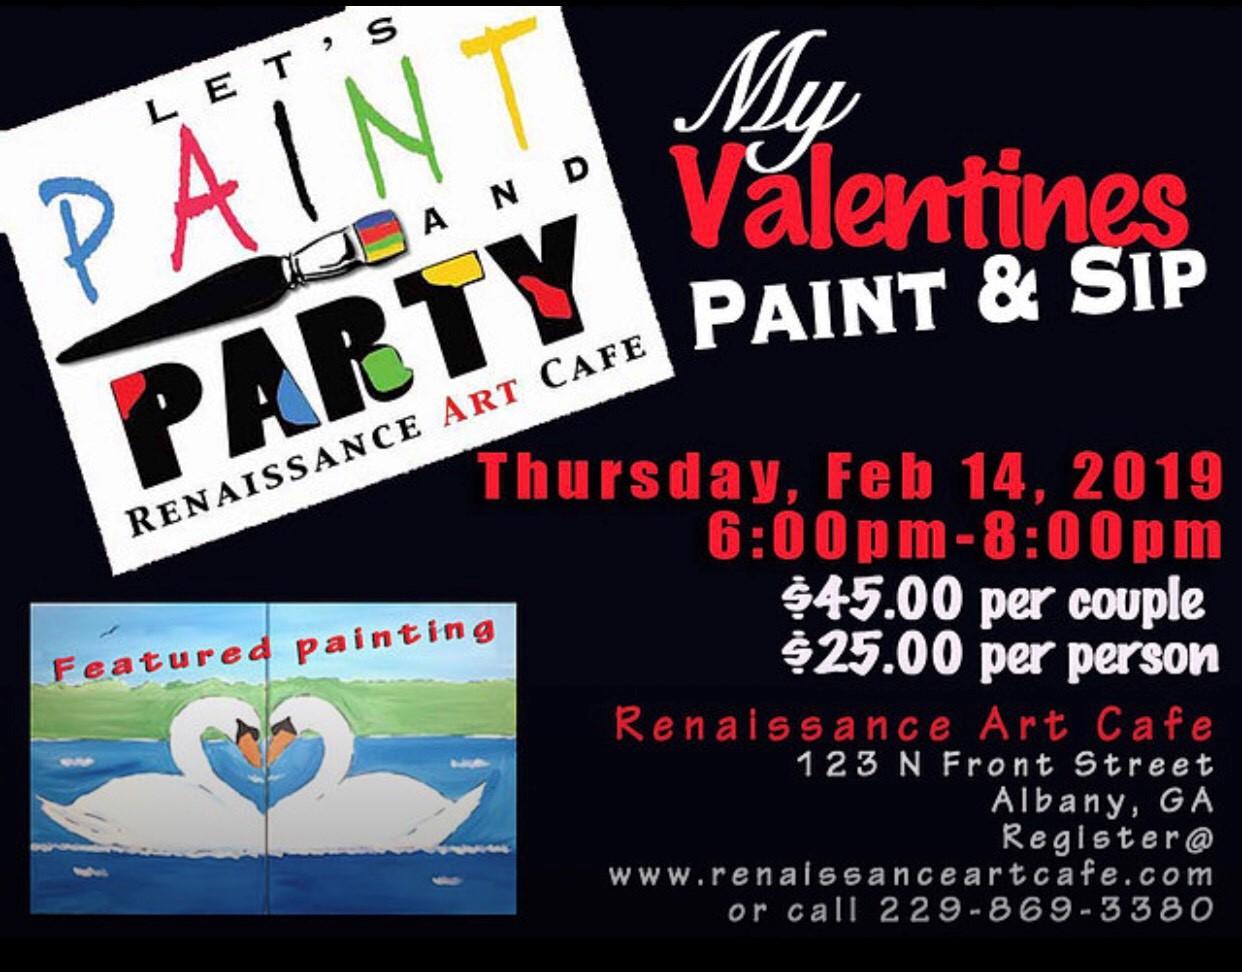 My Valentines Paint & Sip